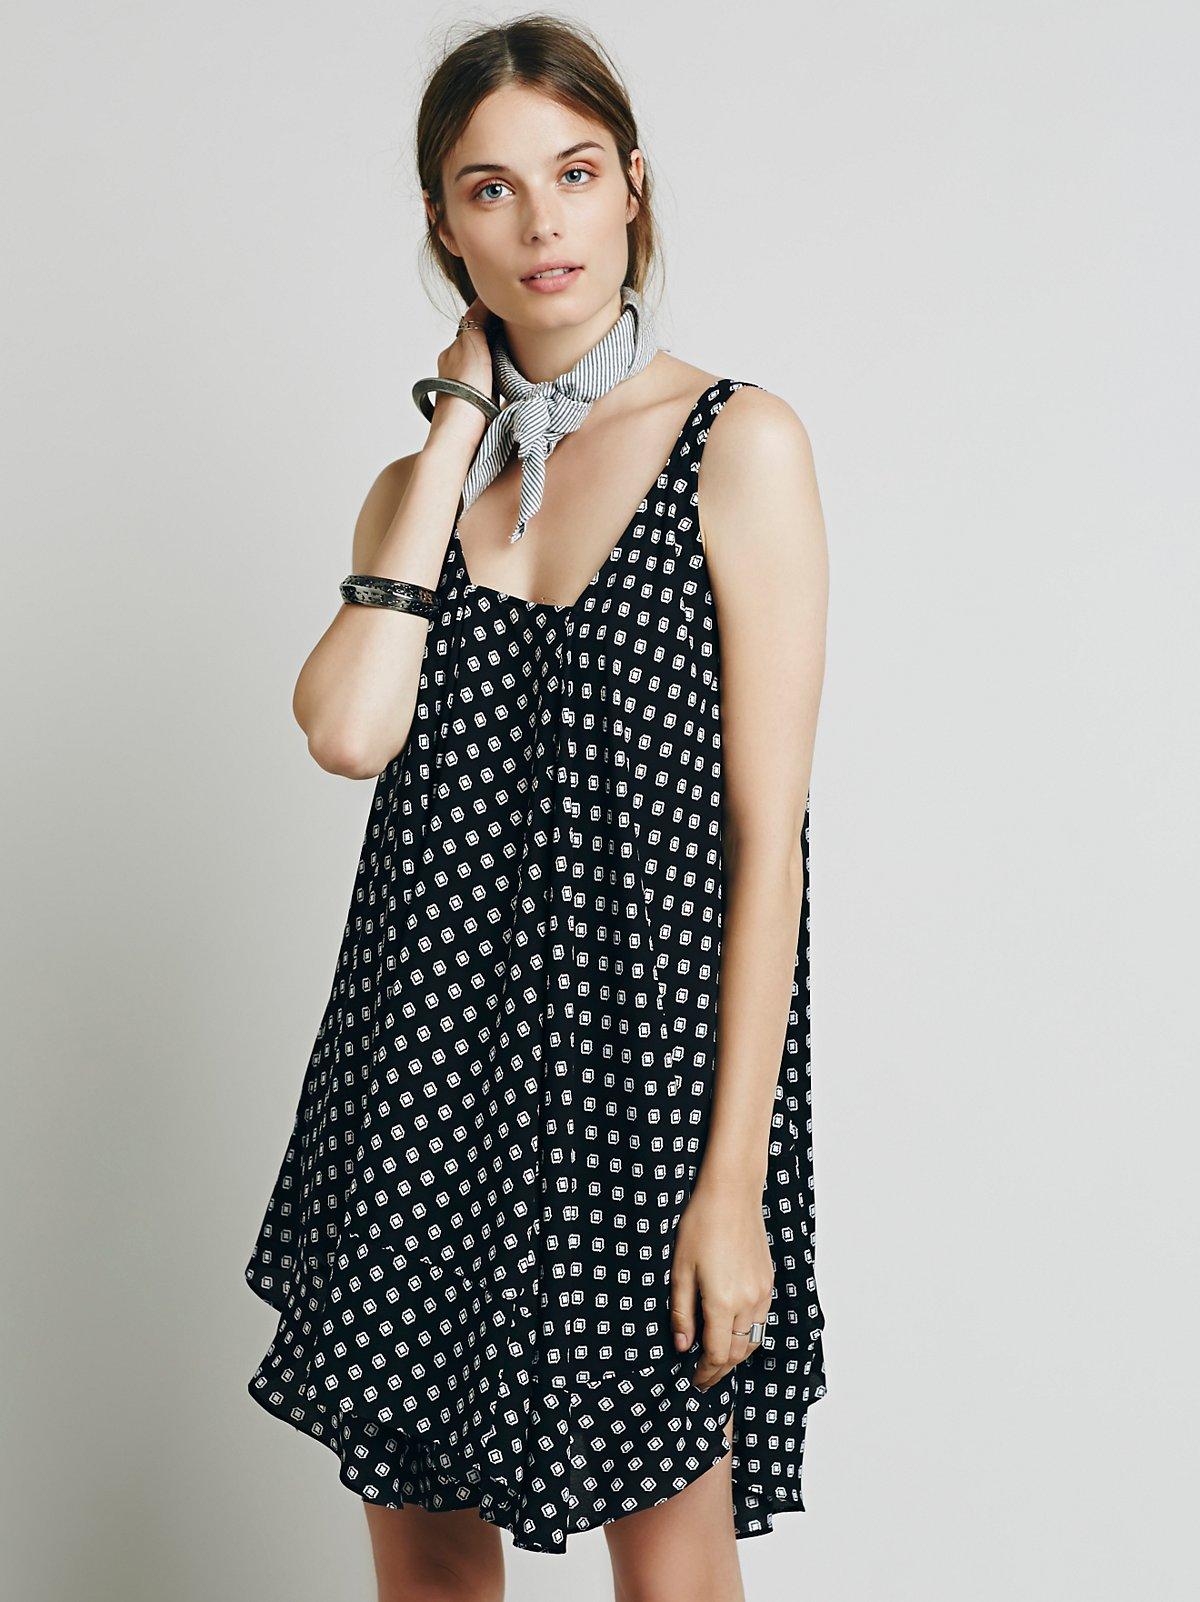 Simply Trapeze连衣裙